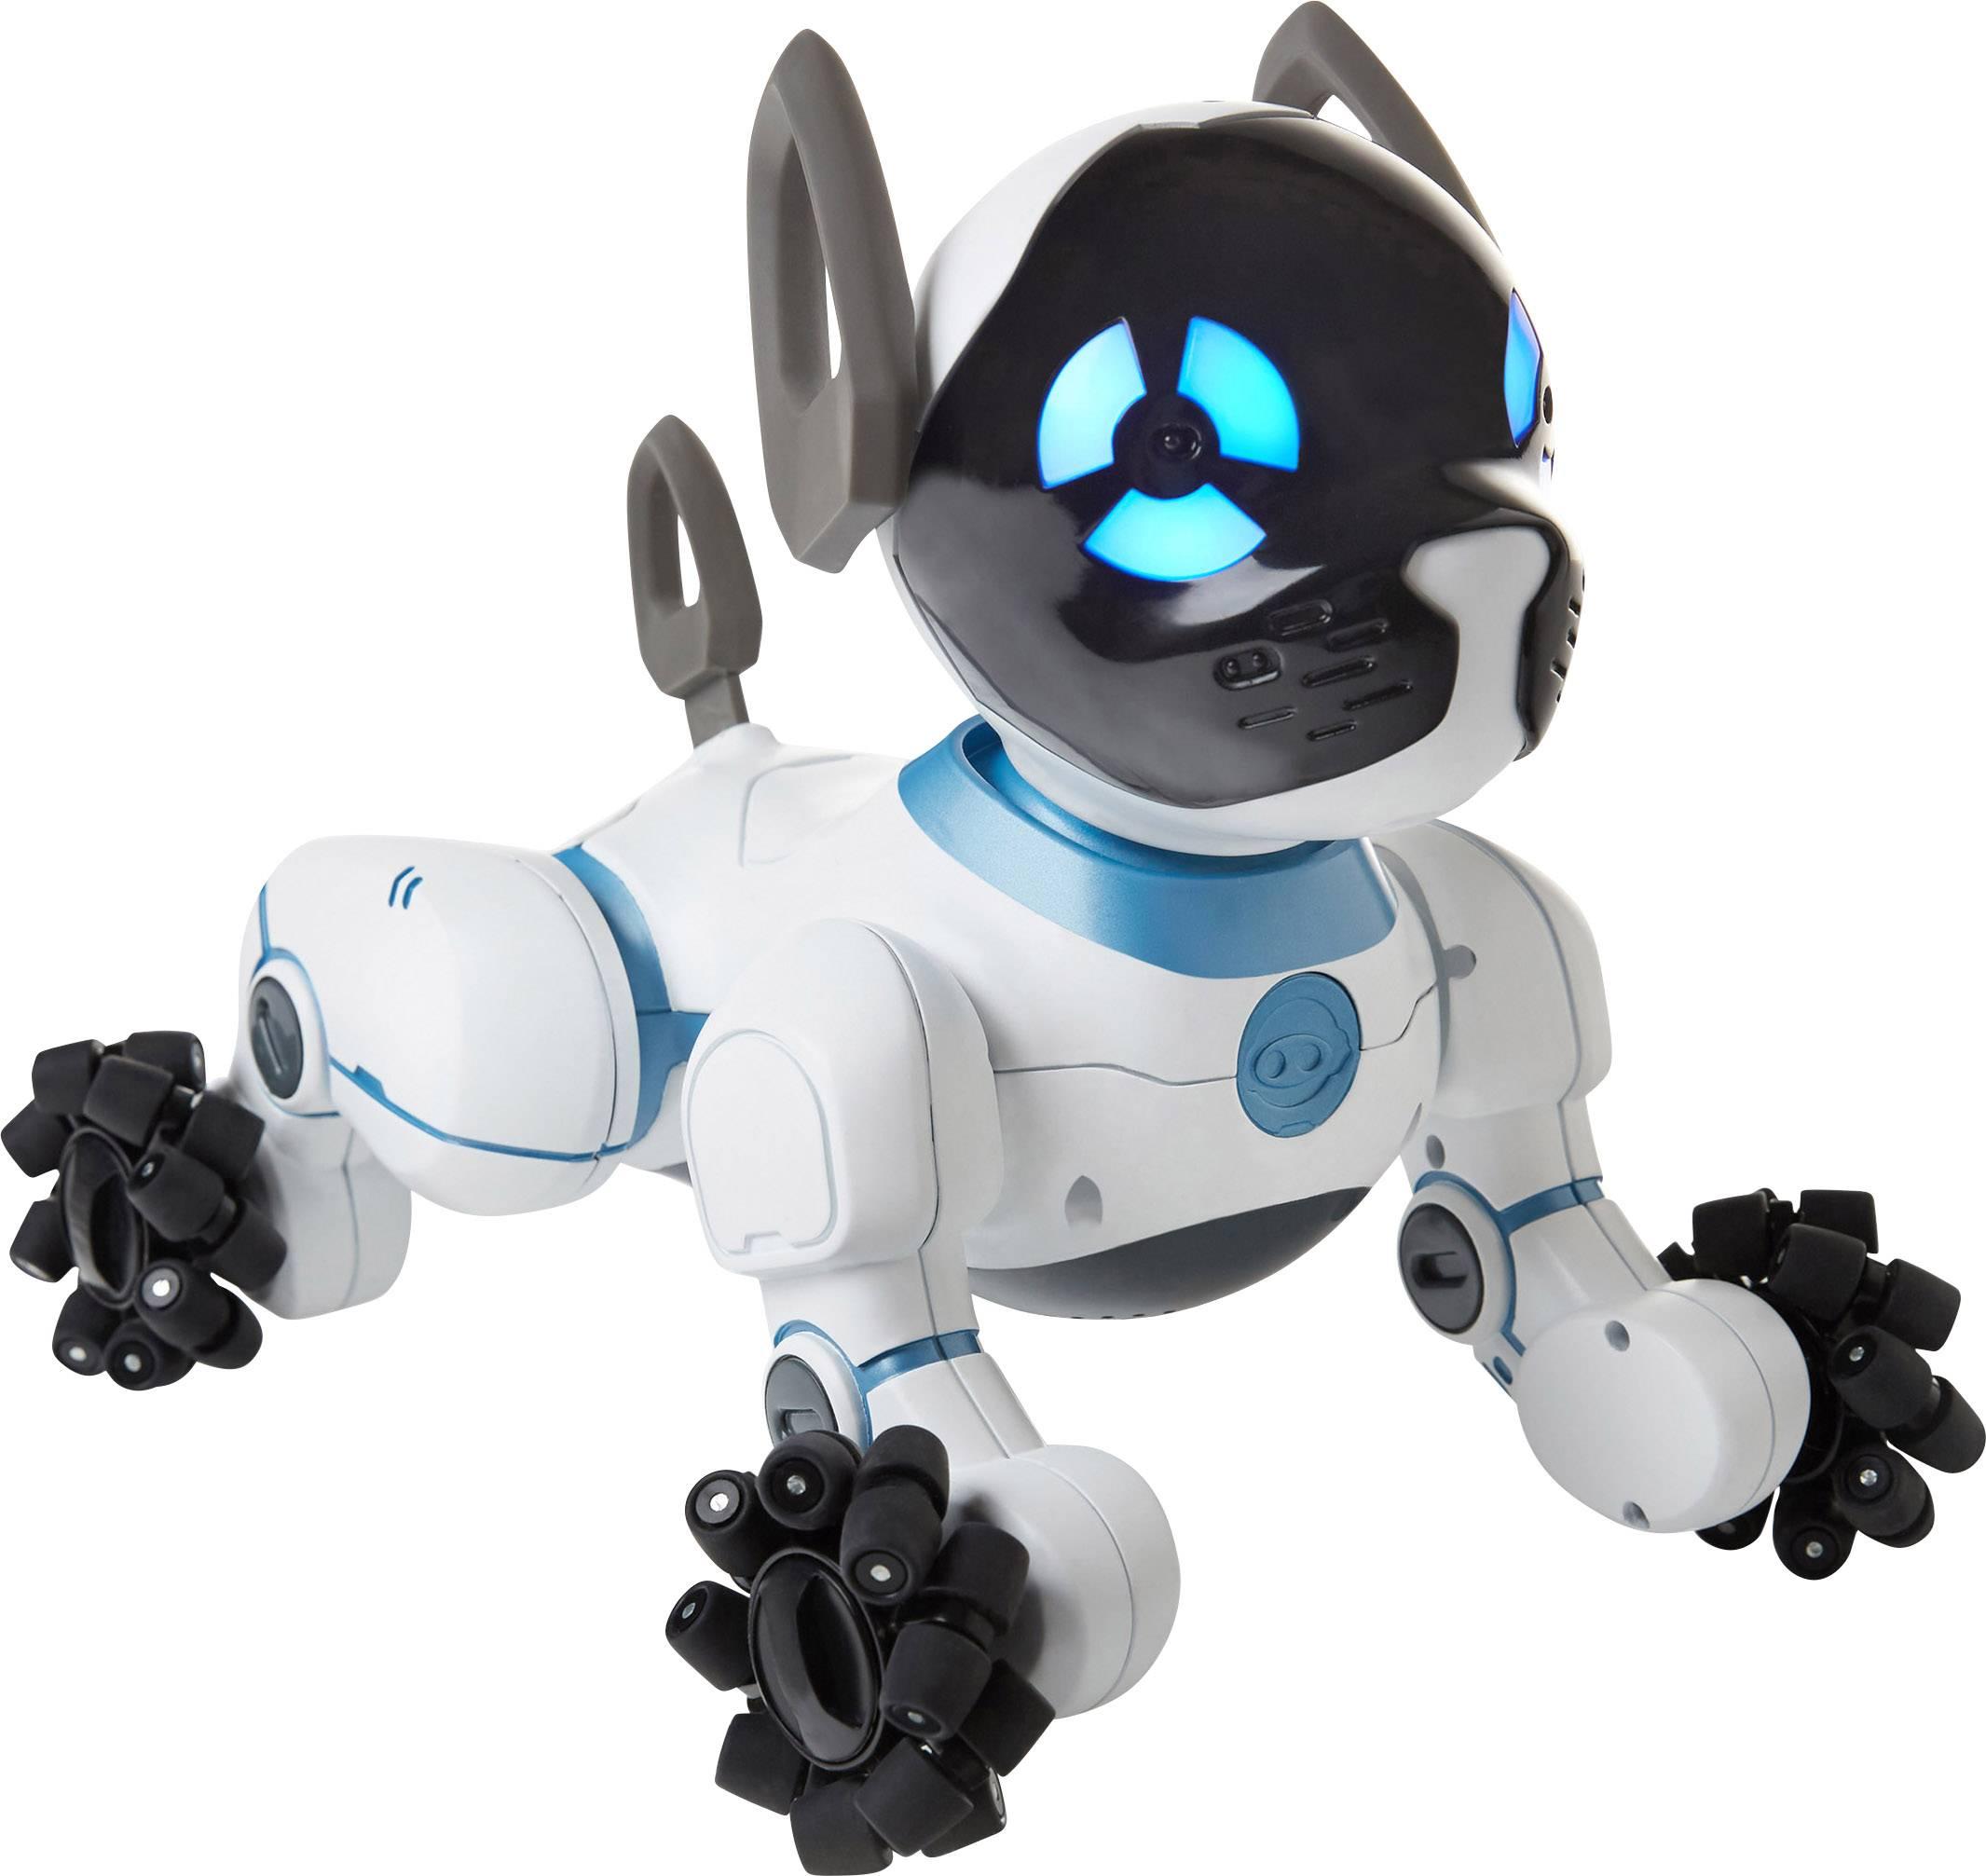 Hračka robota WowWee Robotics CHIP Roboterhund 0805